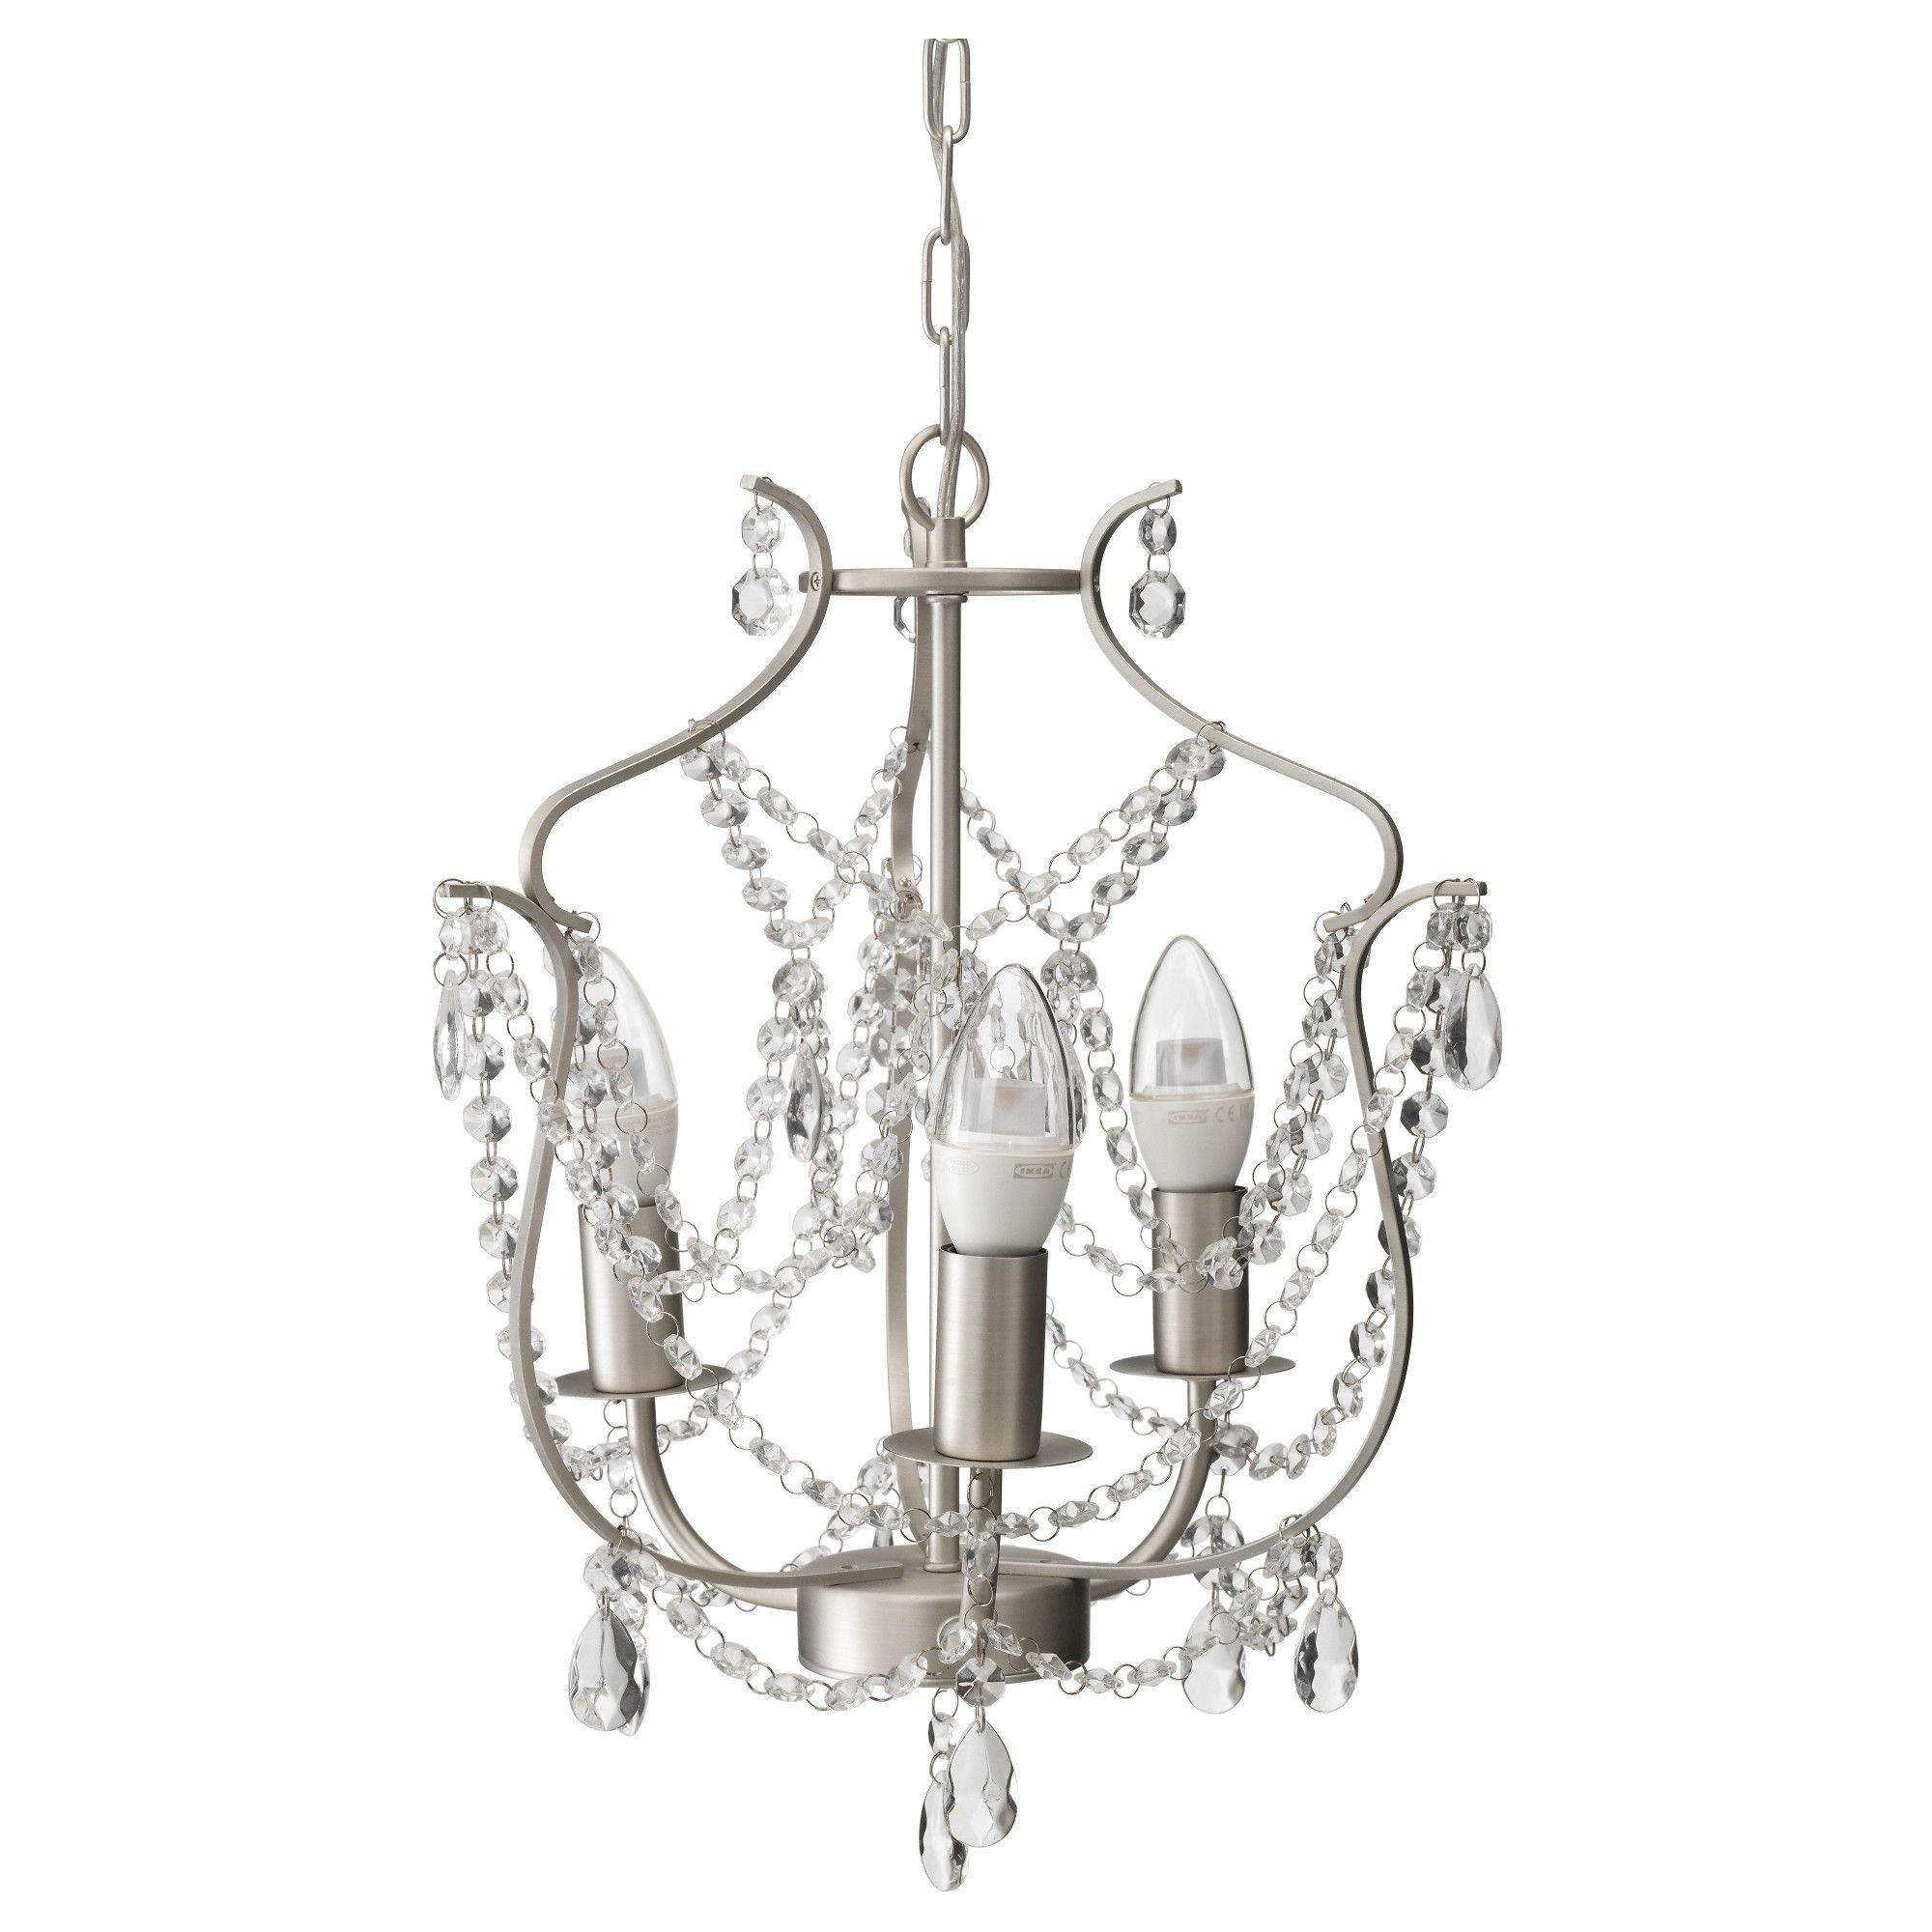 Chandelier for Teenage Girl Bedroom Beautiful Kristaller Chandelier 3 Armed Silver Color Glass